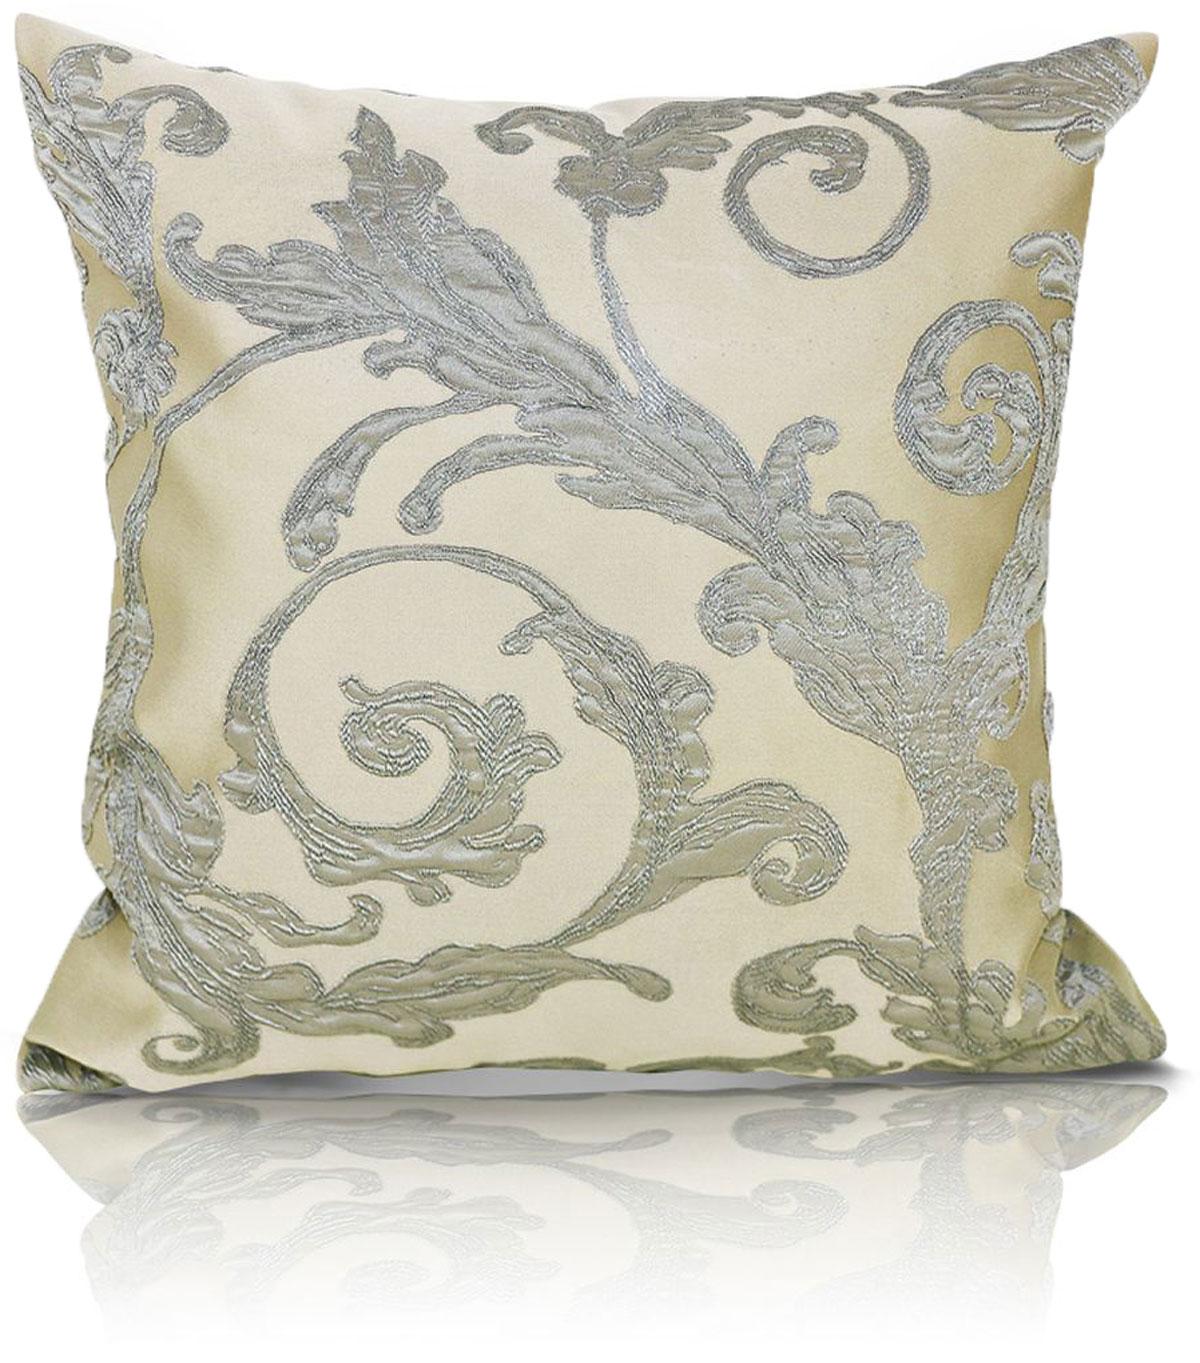 Подушка декоративная KauffOrt Виона, цвет: бежевый, 40 x 40 см штора легкая kauffort barolo